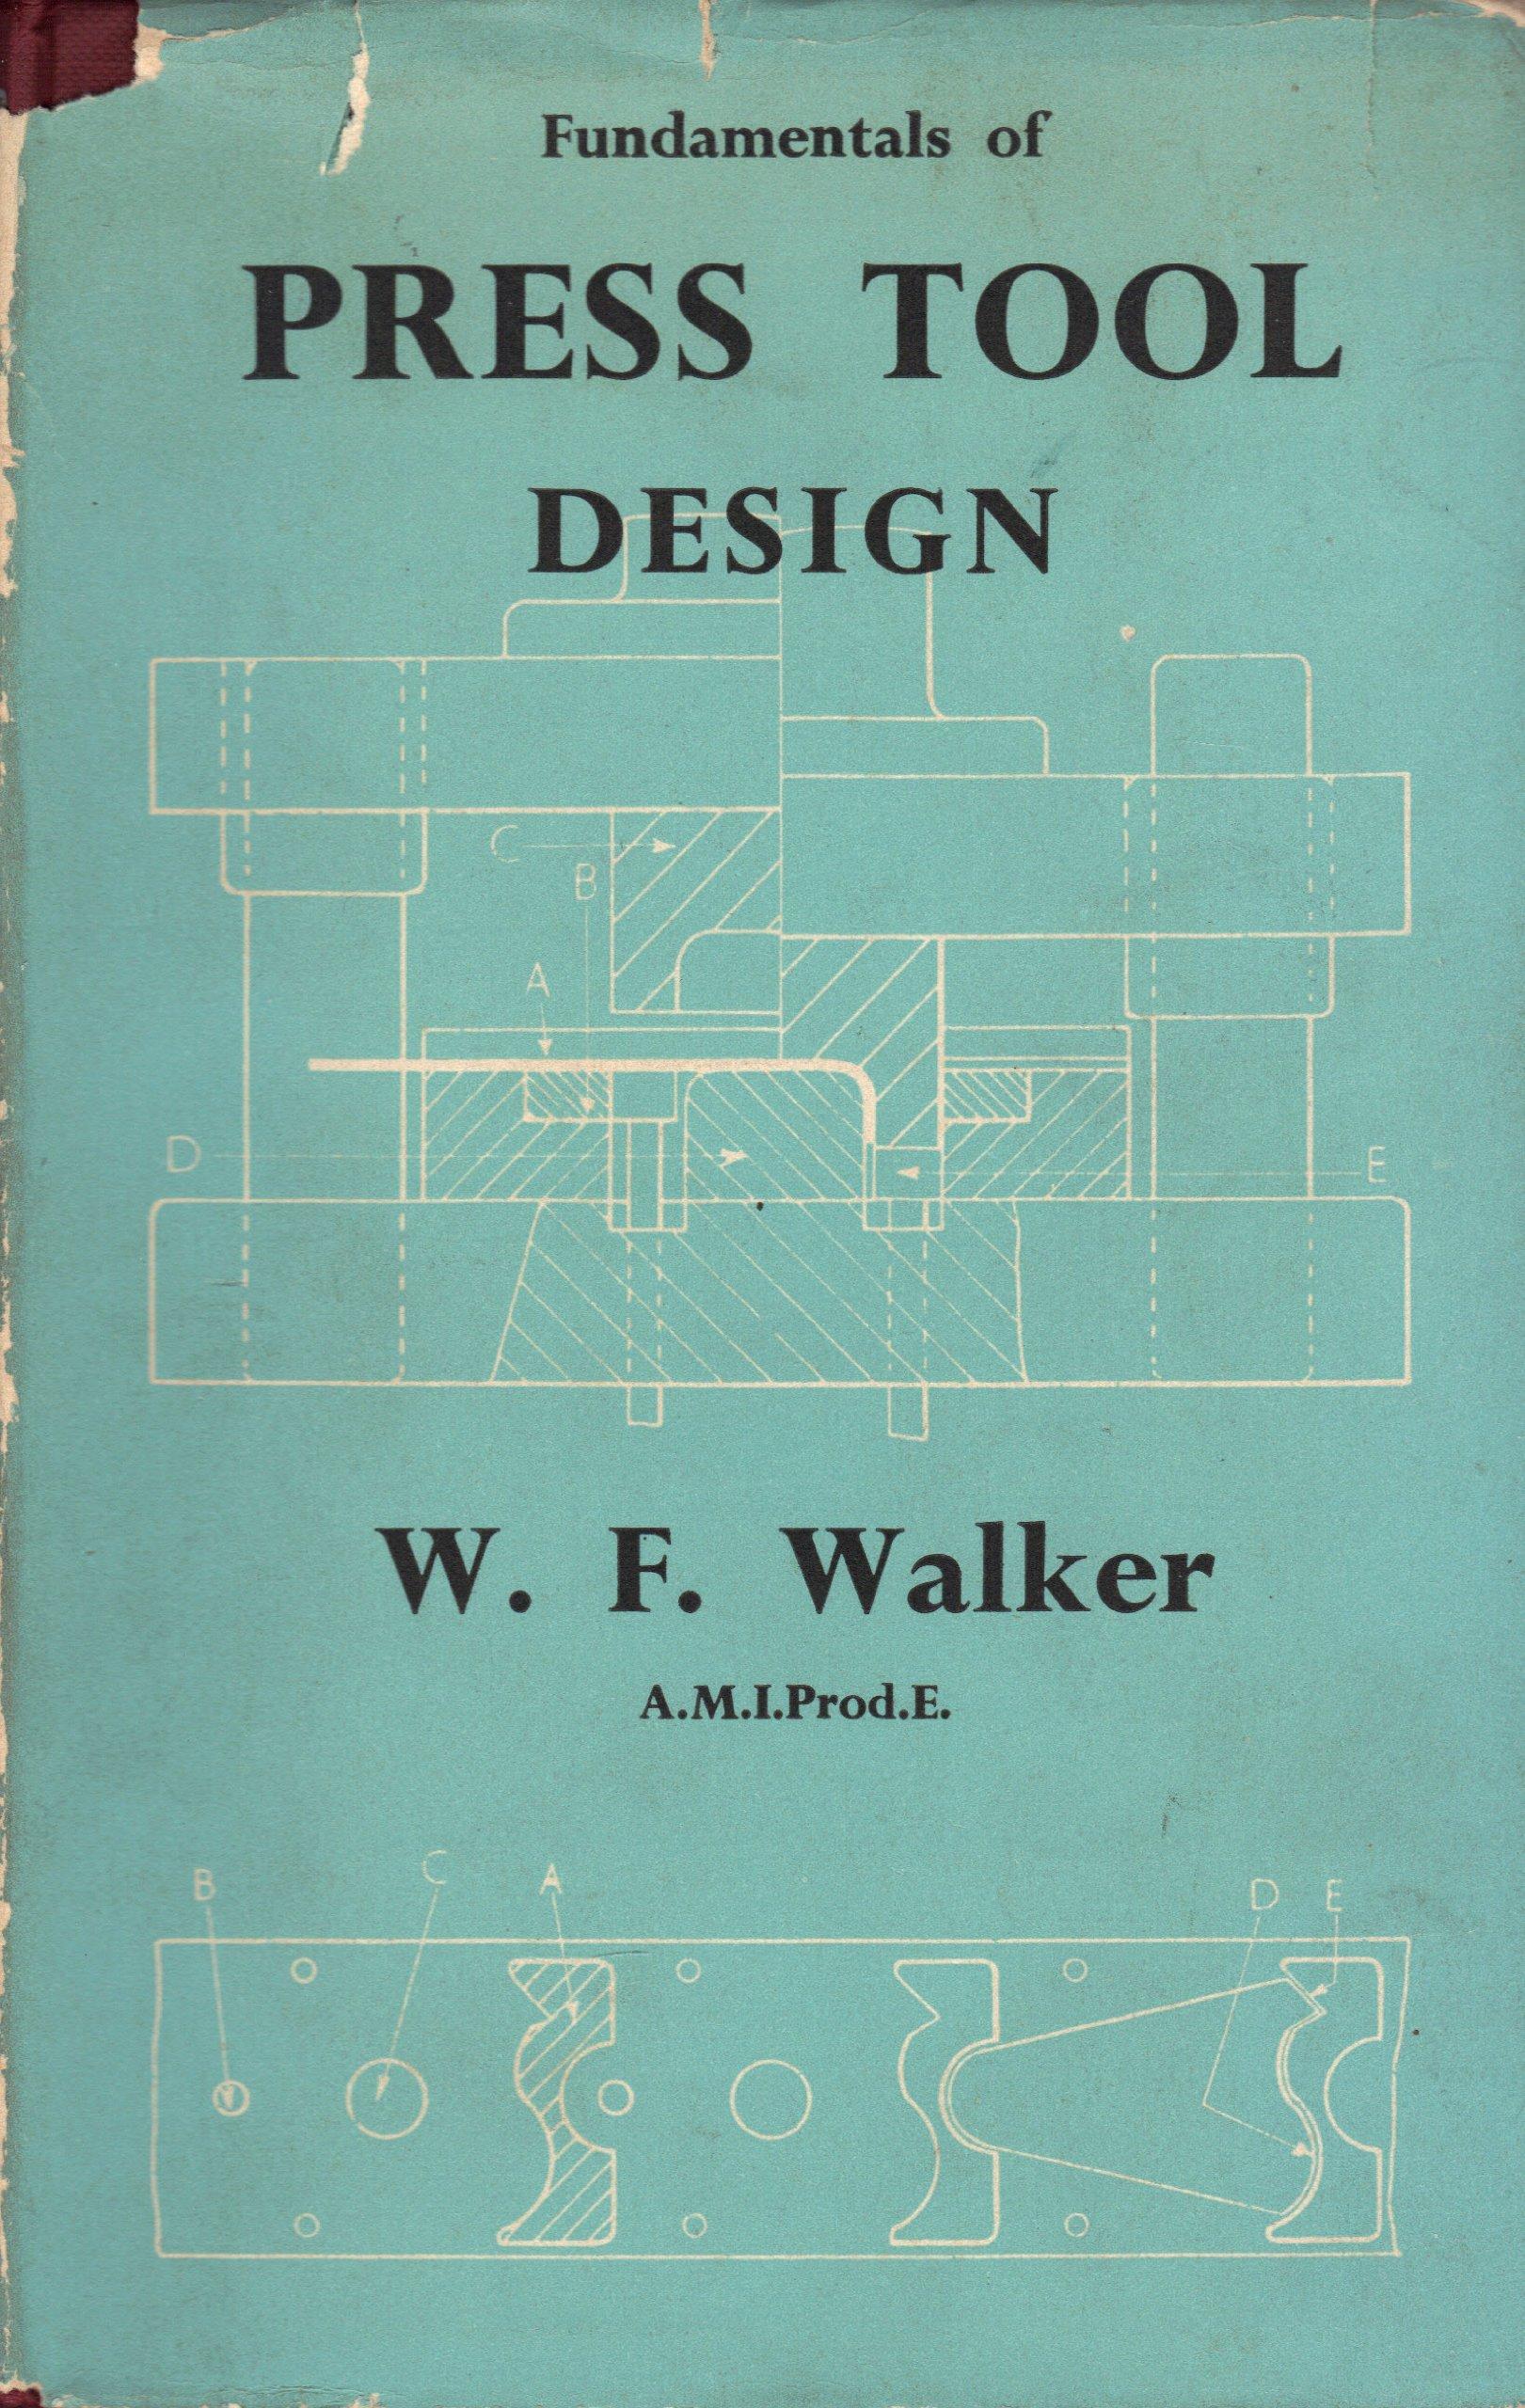 PRESS TOOL DESIGN BOOKS EBOOK